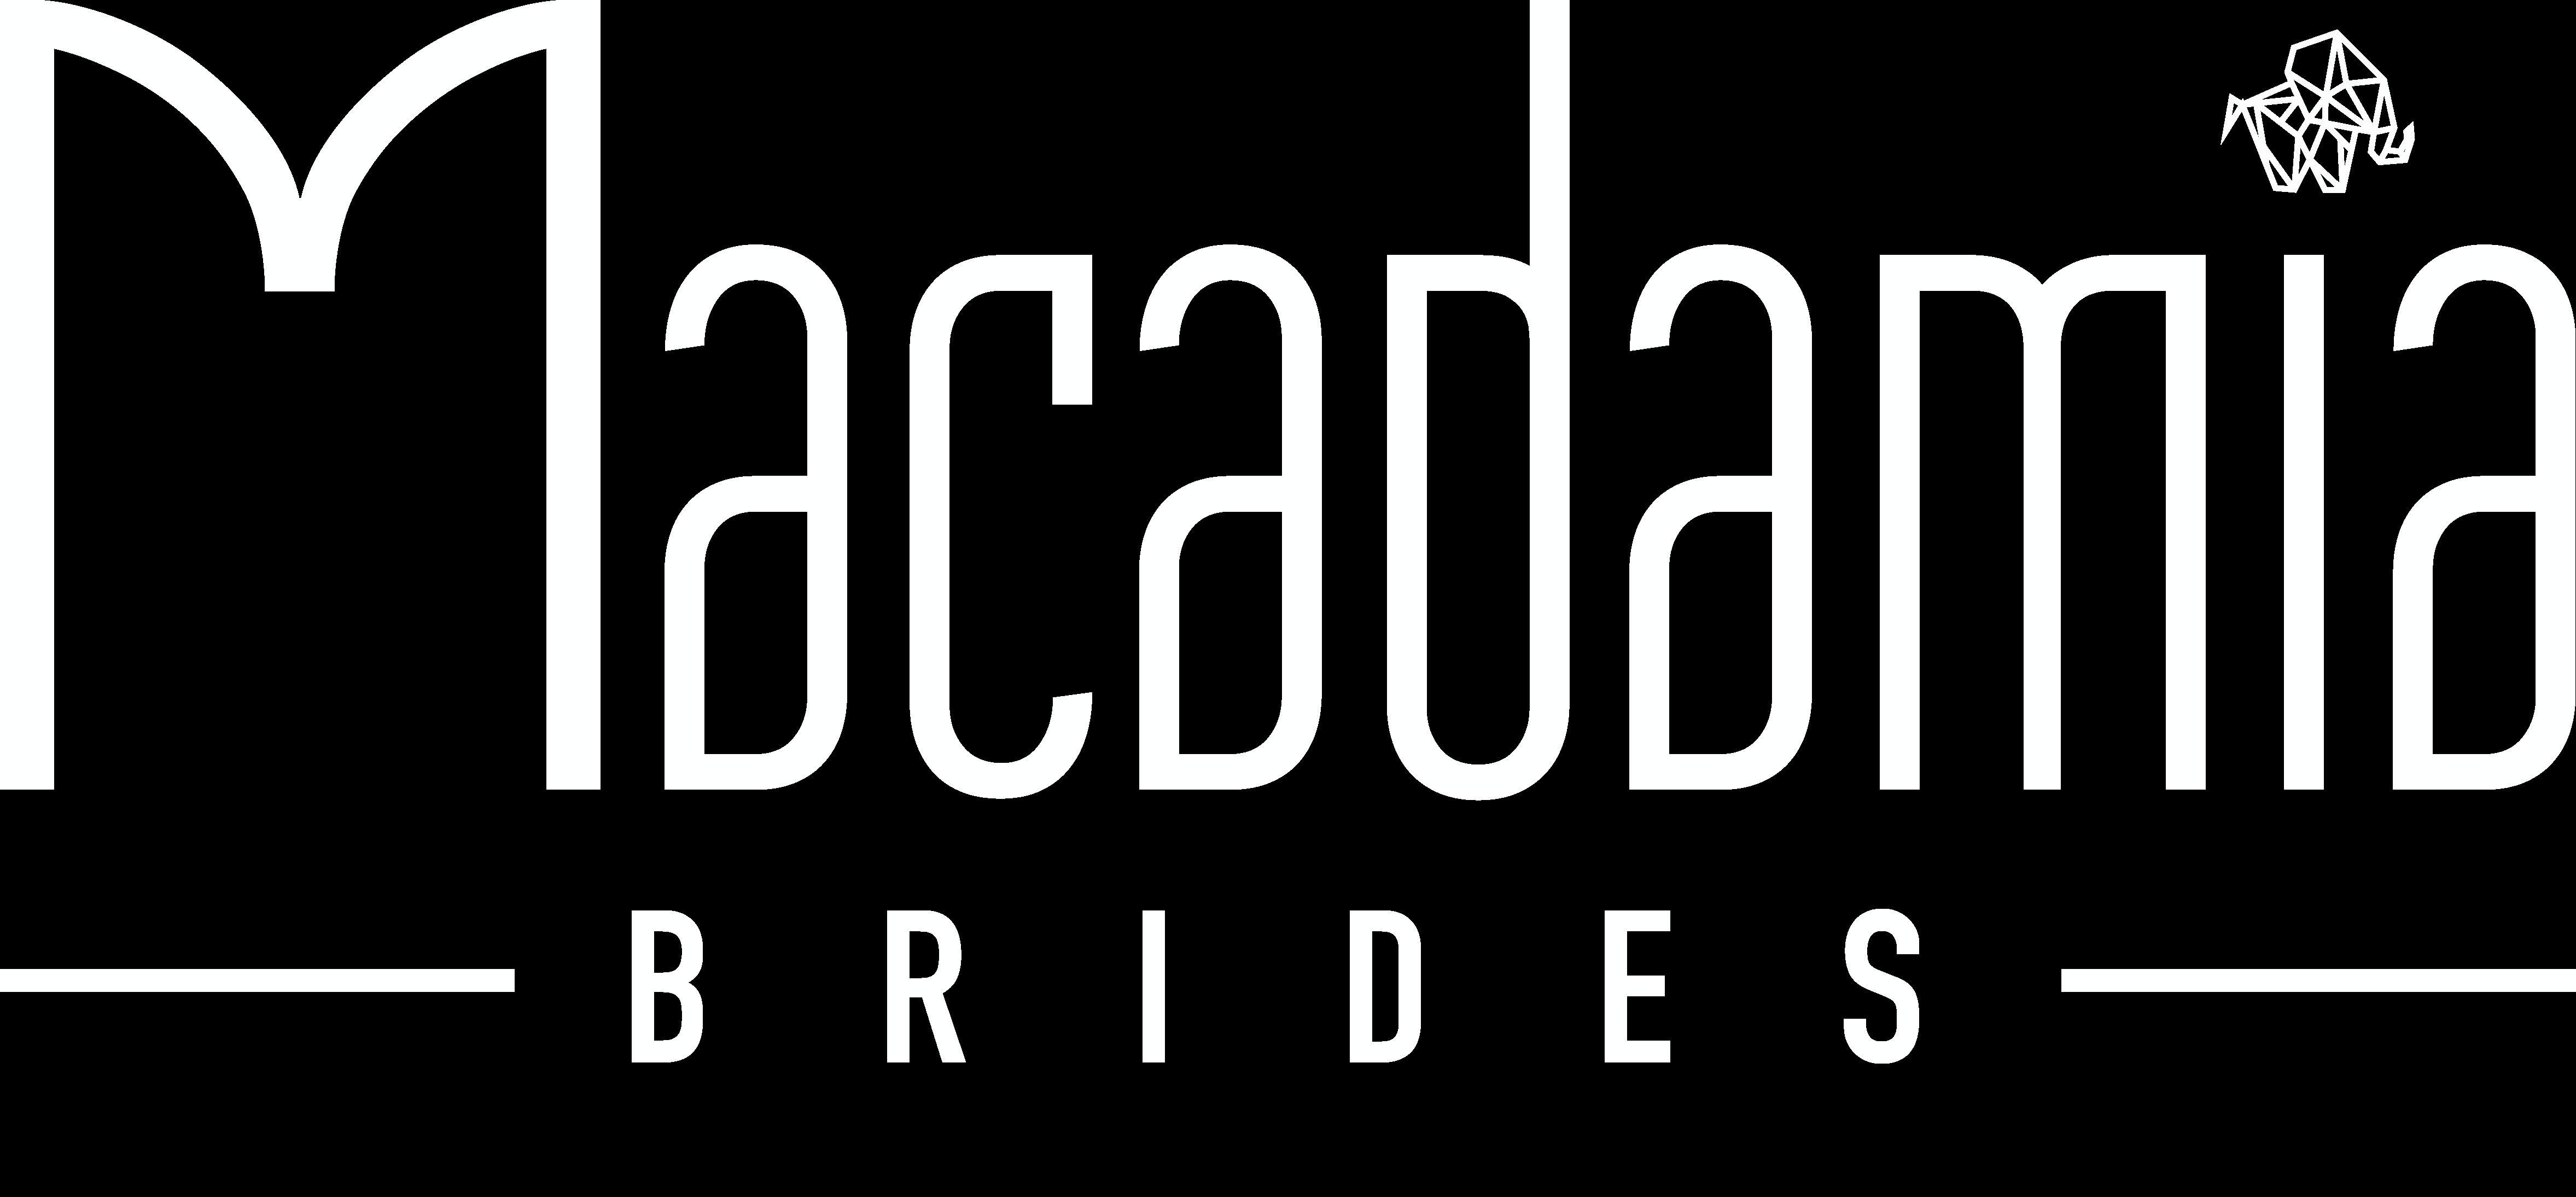 Macadamia Brand